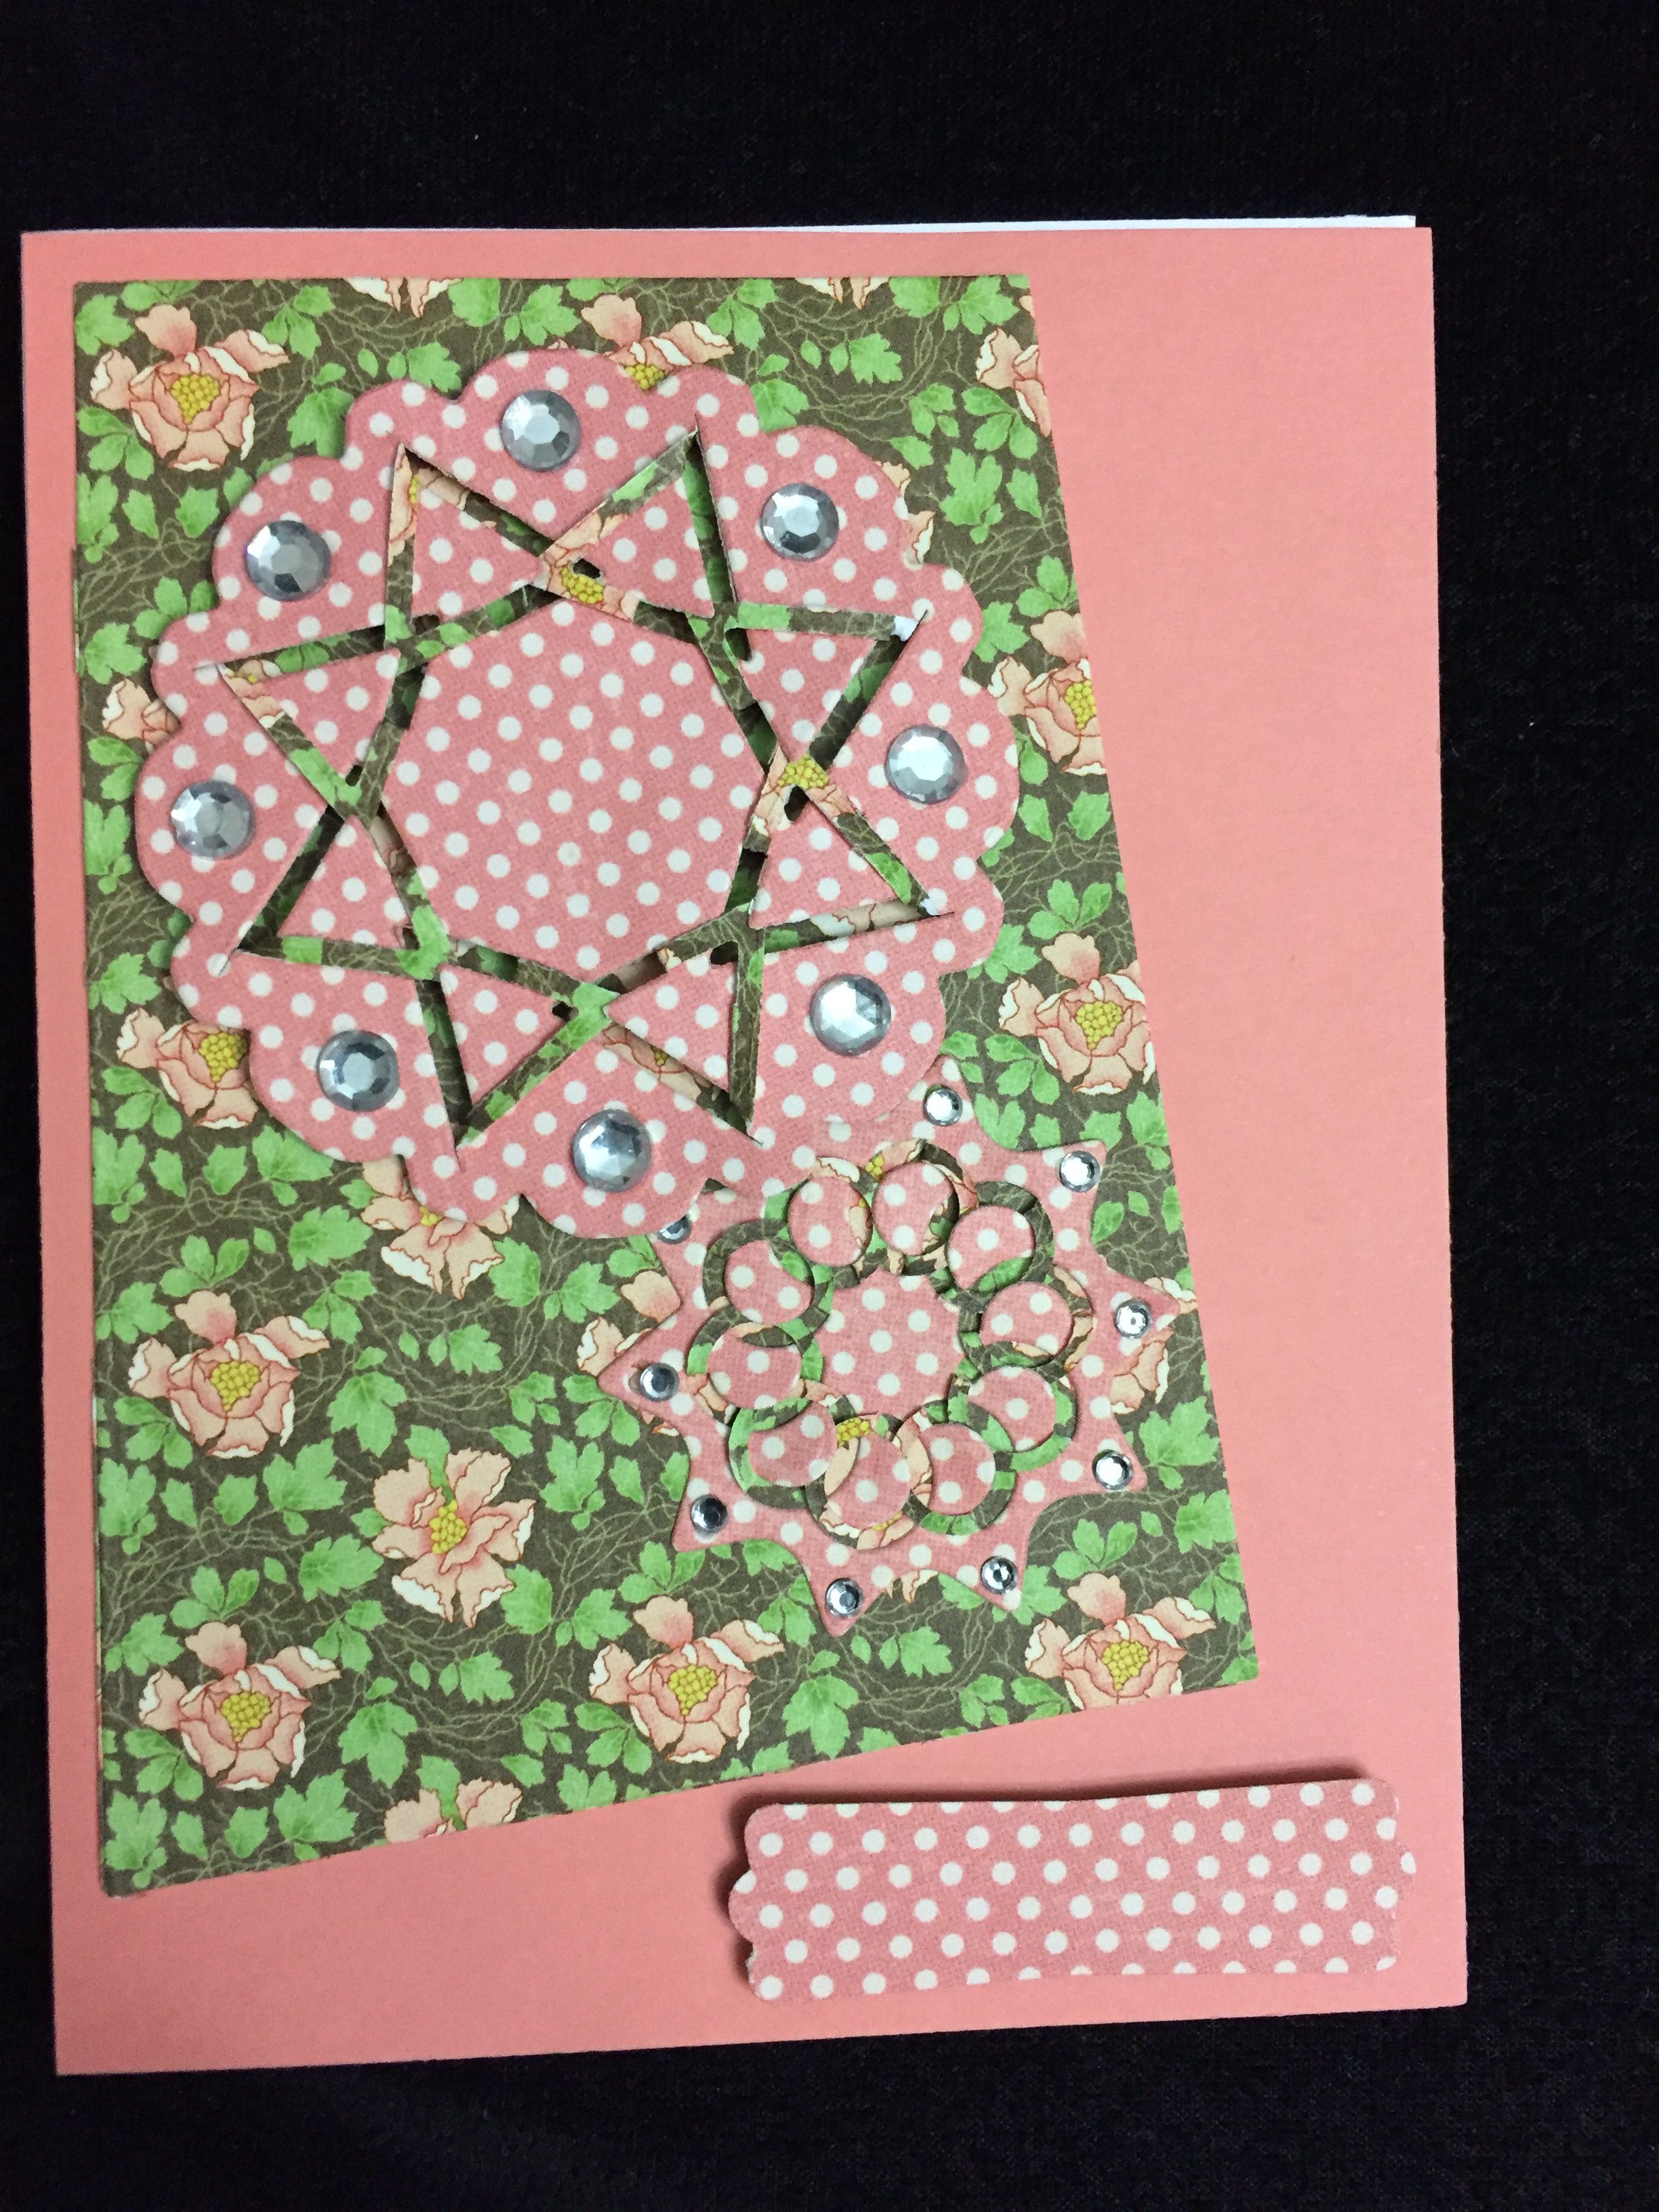 April 6th class 6 class hobby cards